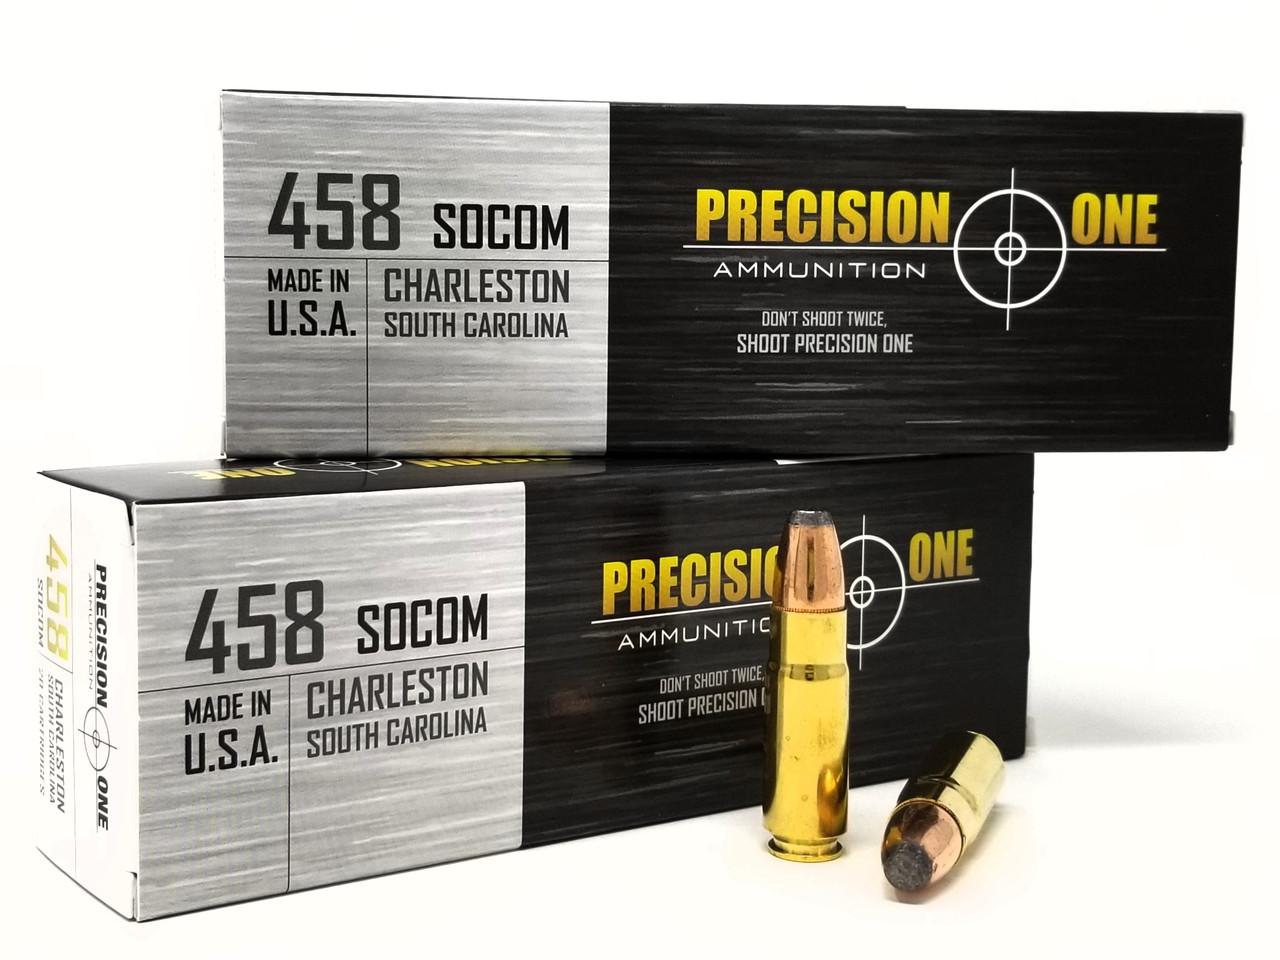 458 SOCOM Ammo